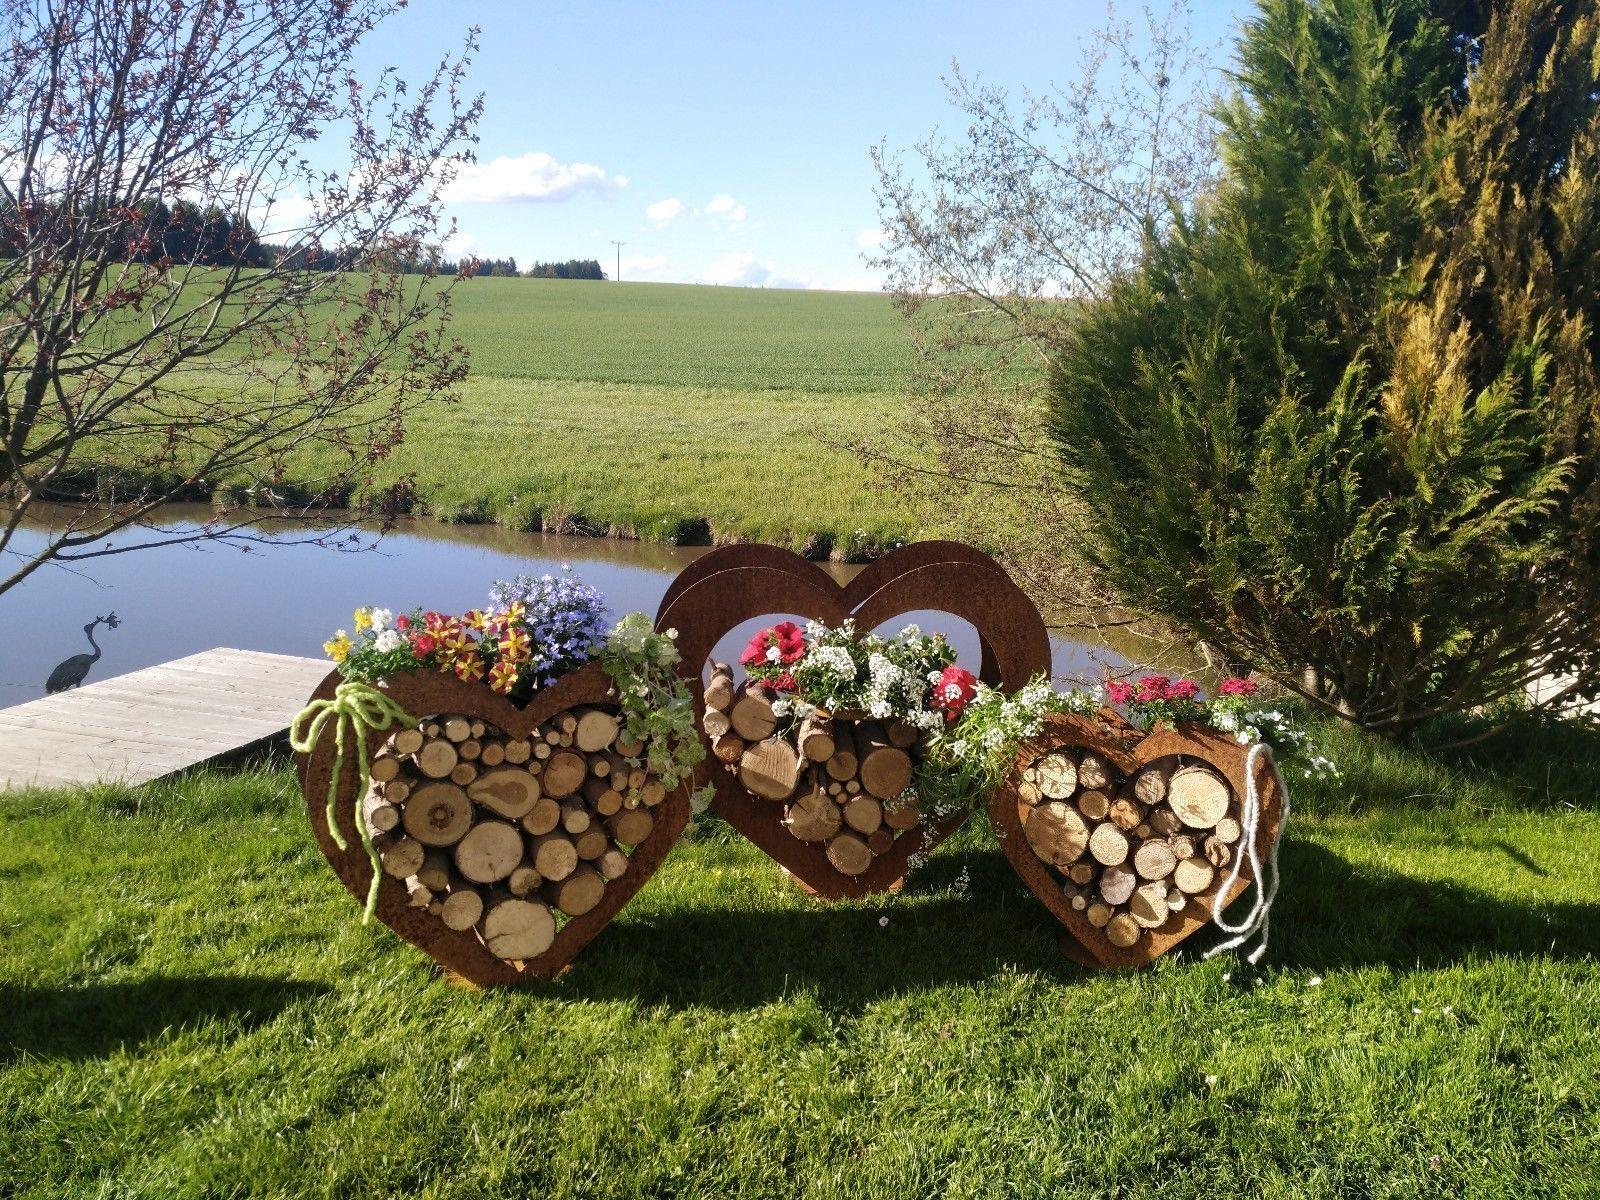 Herz Aus Metall Holz Regal Edel Rost Garten Terrasse Deko Riesig Ebay Rost Deko Garten Holzgitter Gartenfiguren